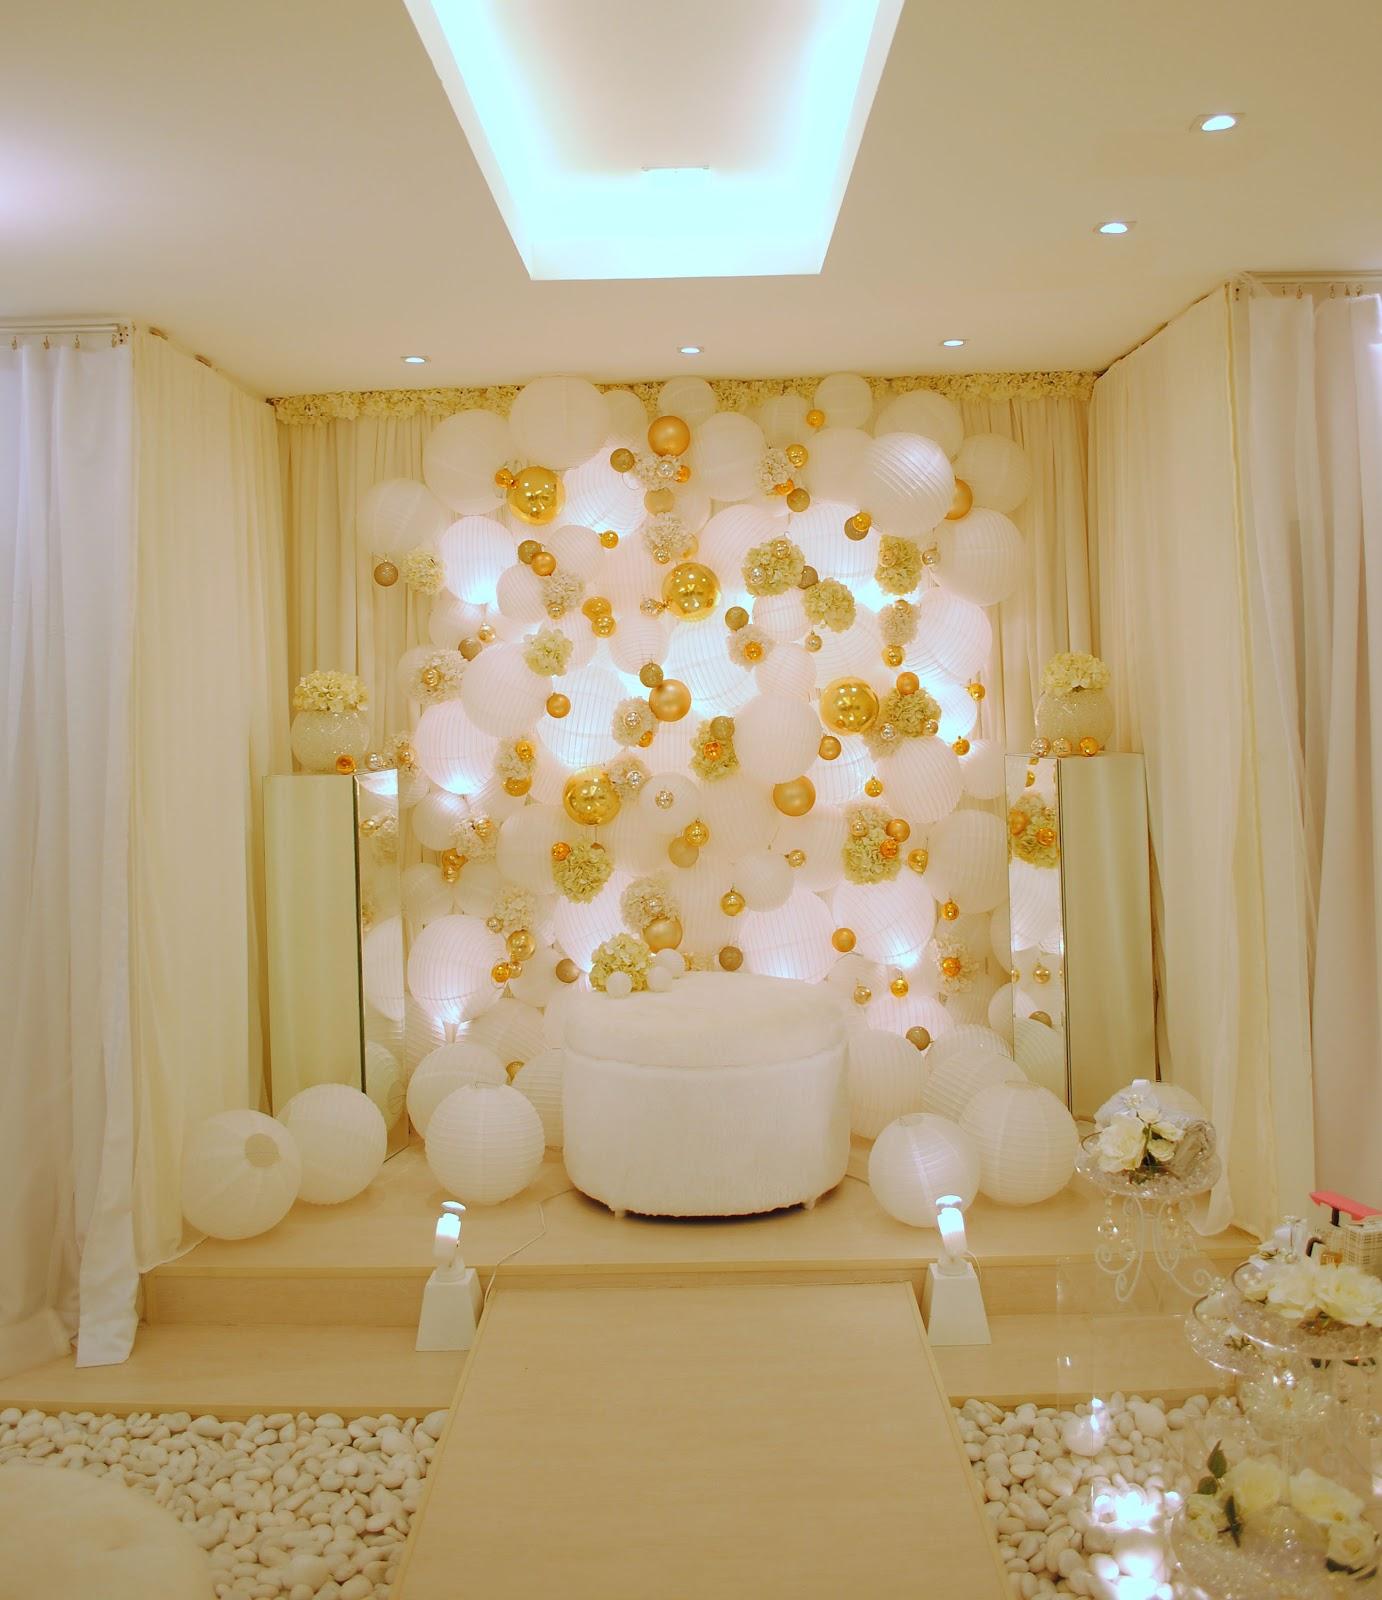 Wedding Nikah Simple Backdrop Decoration Muslim: SAIFUL SIN_the Designer: New Pelamin Designs By Saiful Sin